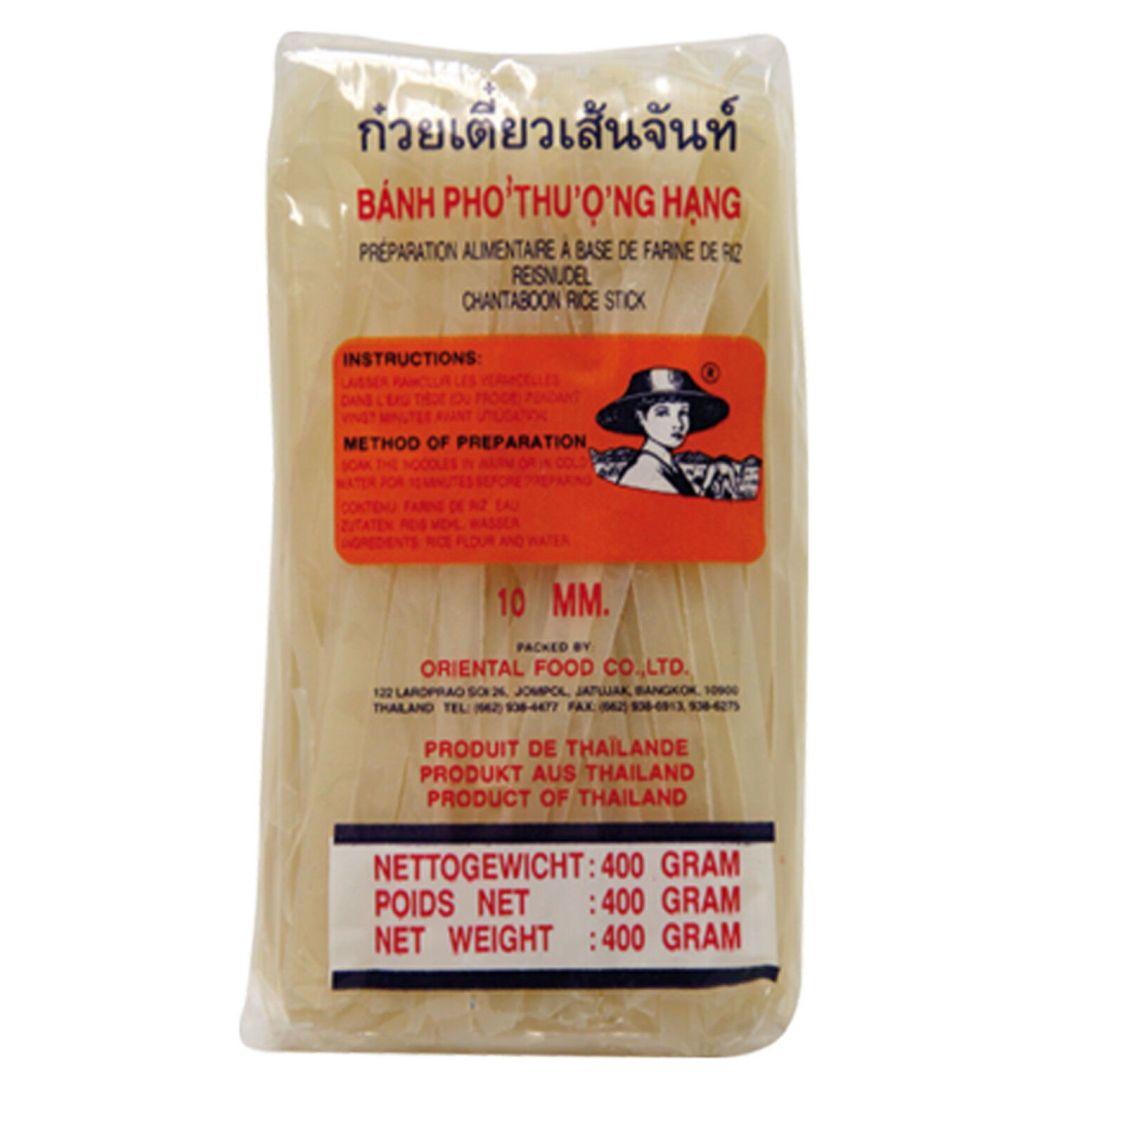 10mm breite Reisnudeln 400 g Farmer Brand Ricedicke Reis Nudeln  Asia Nudeln